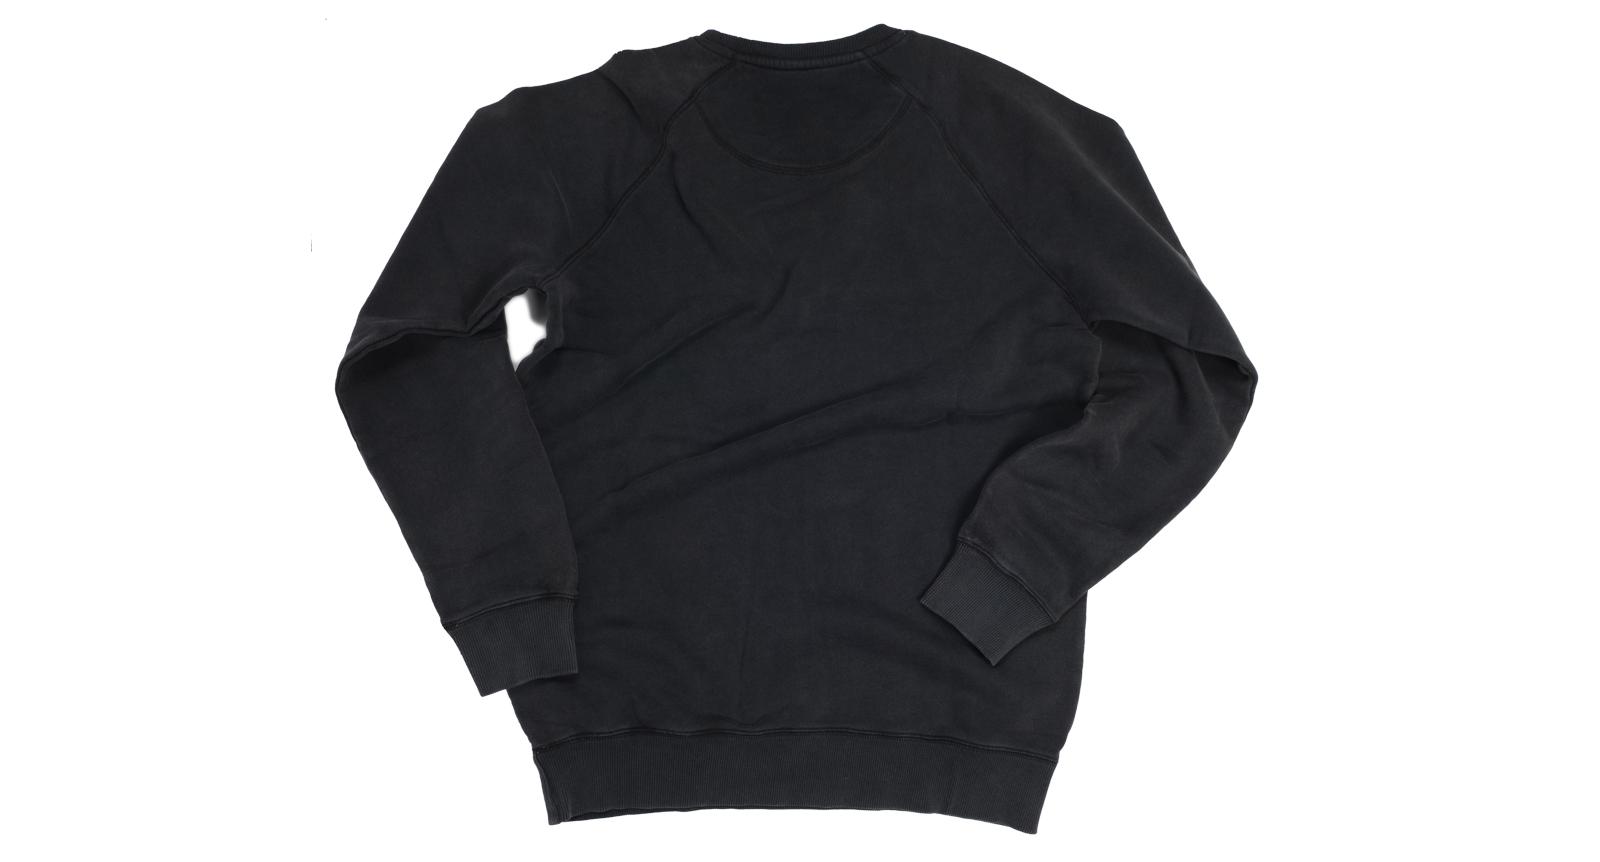 WTF Black sweatshirt.